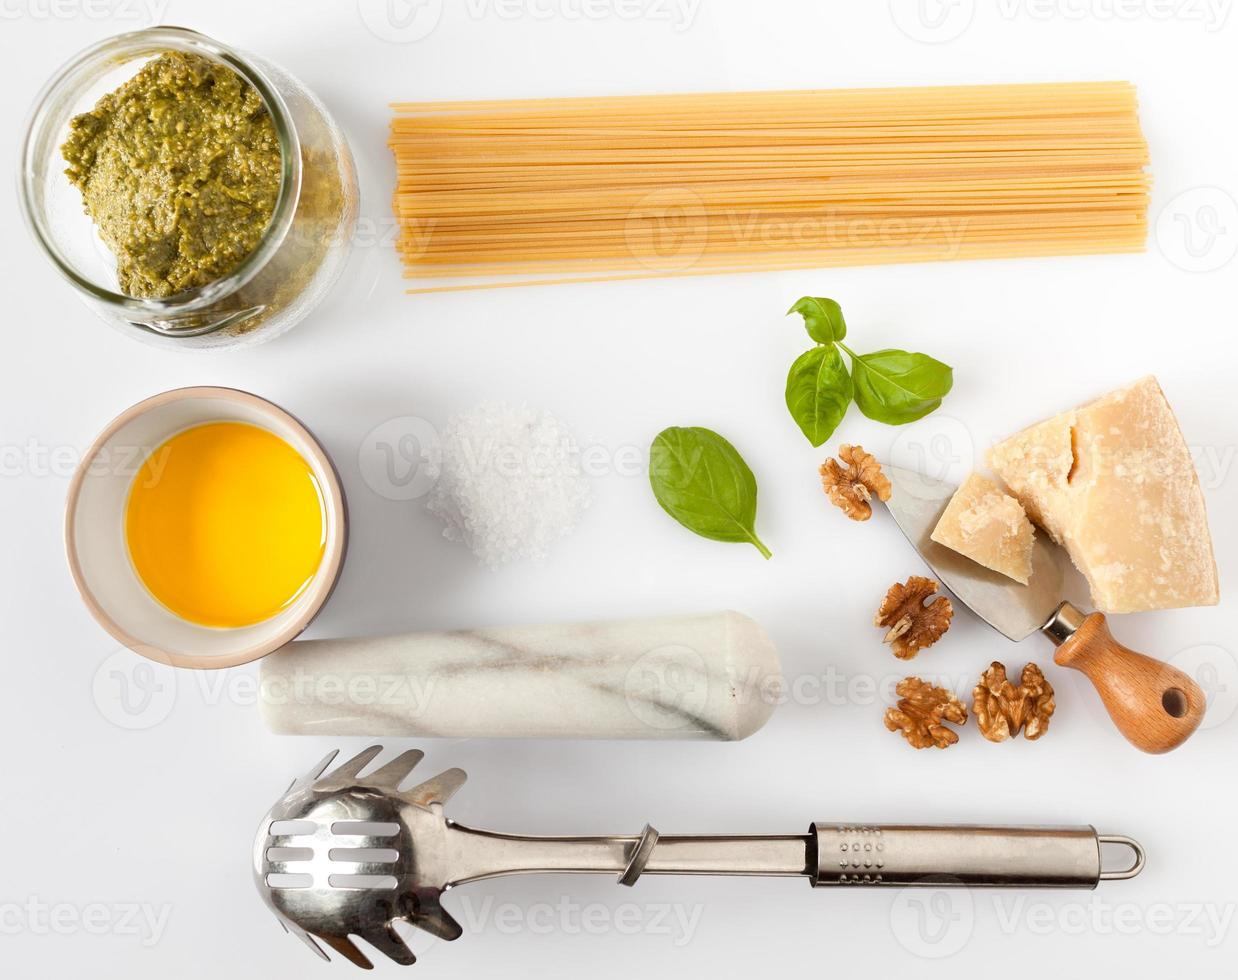 ingrediënten voor spaghetti met pesto foto